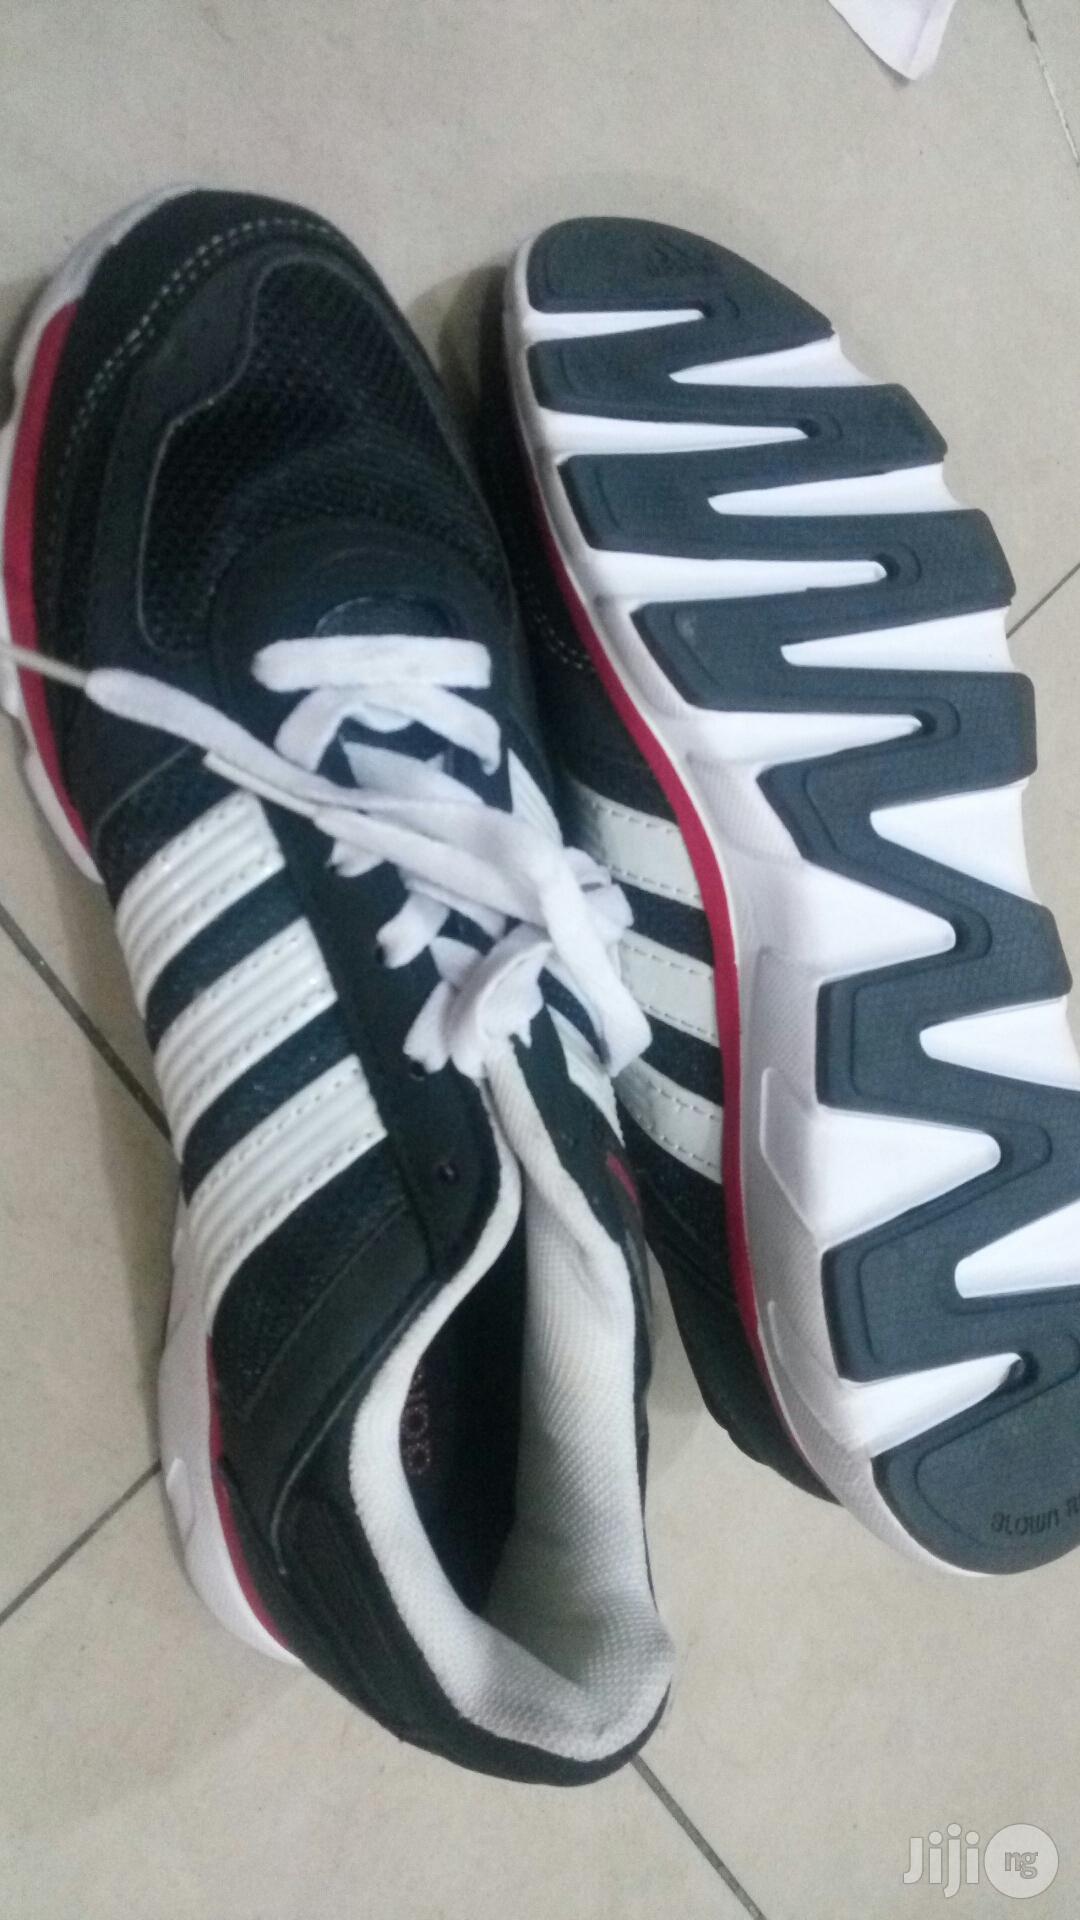 Archive: Adidas Jugging Canvas At Bonnyway Sports Int'l Ltd